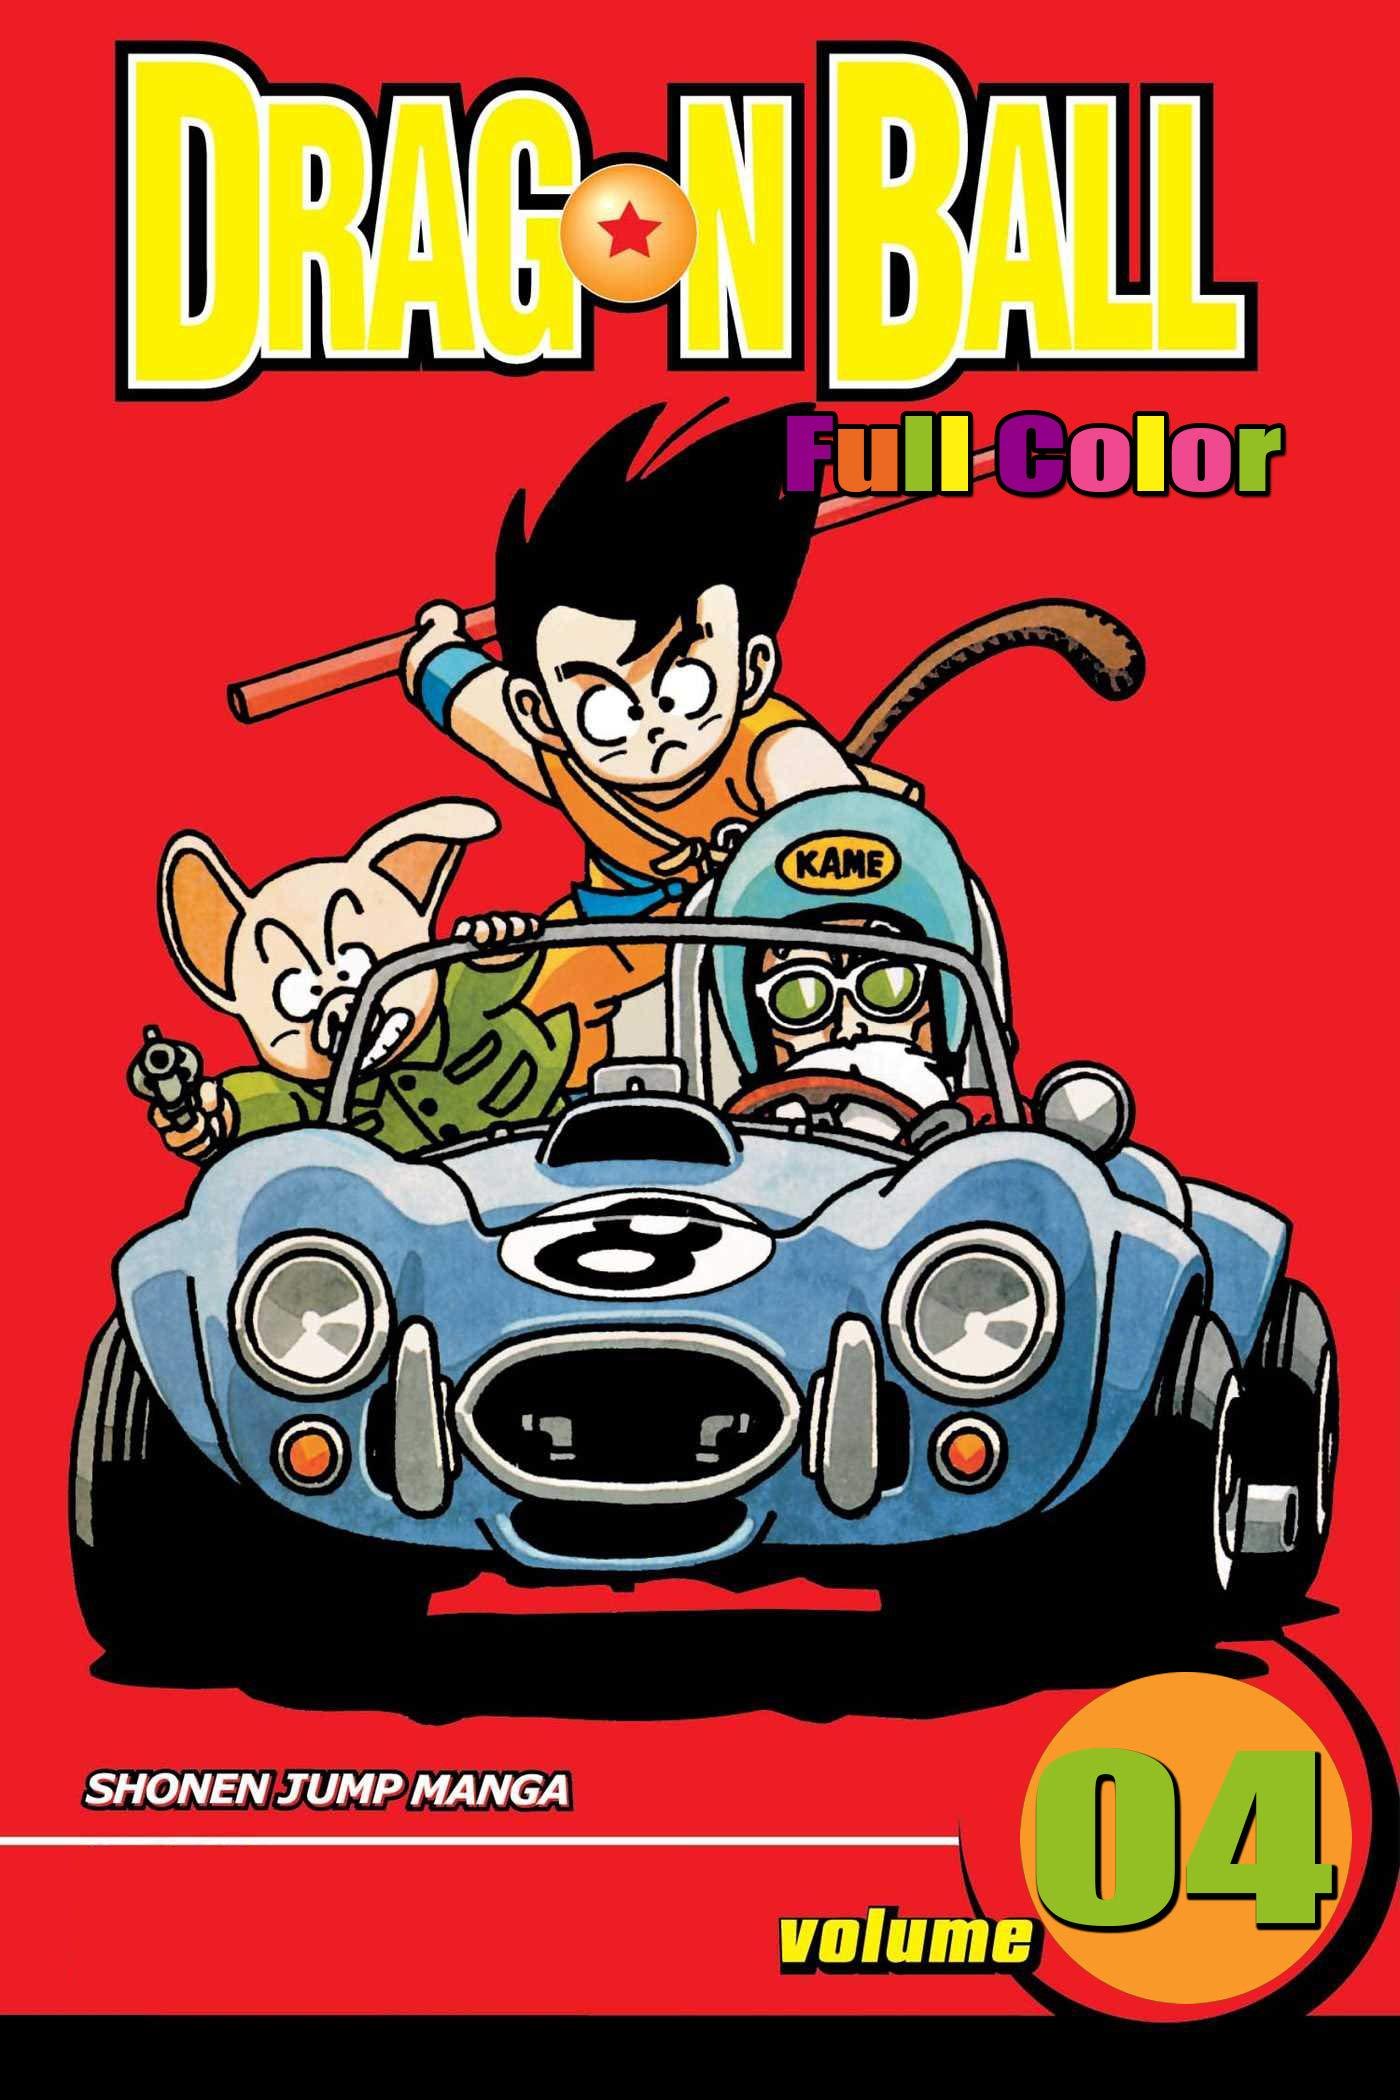 MangaFull Color Edition: Dragon Ball Mangal volume 4